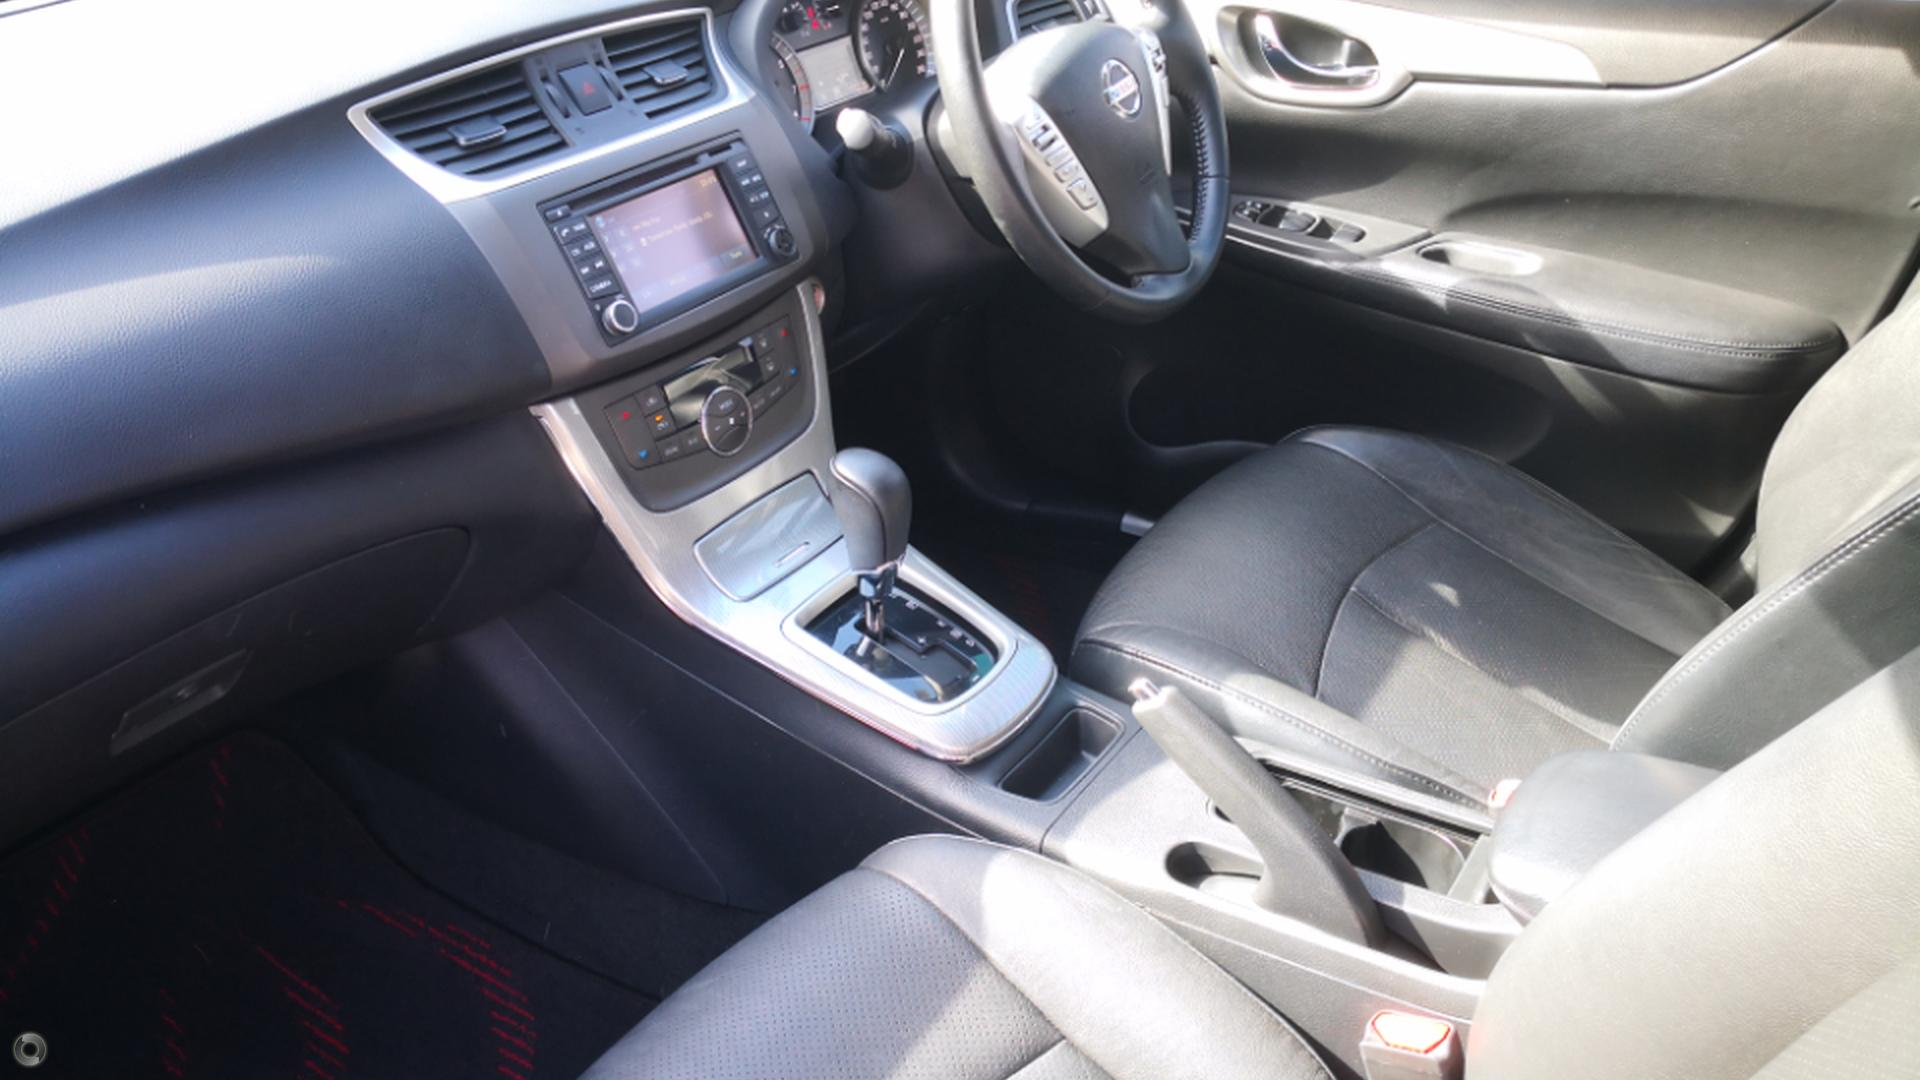 2015 Nissan Pulsar SSS C12 Series 2